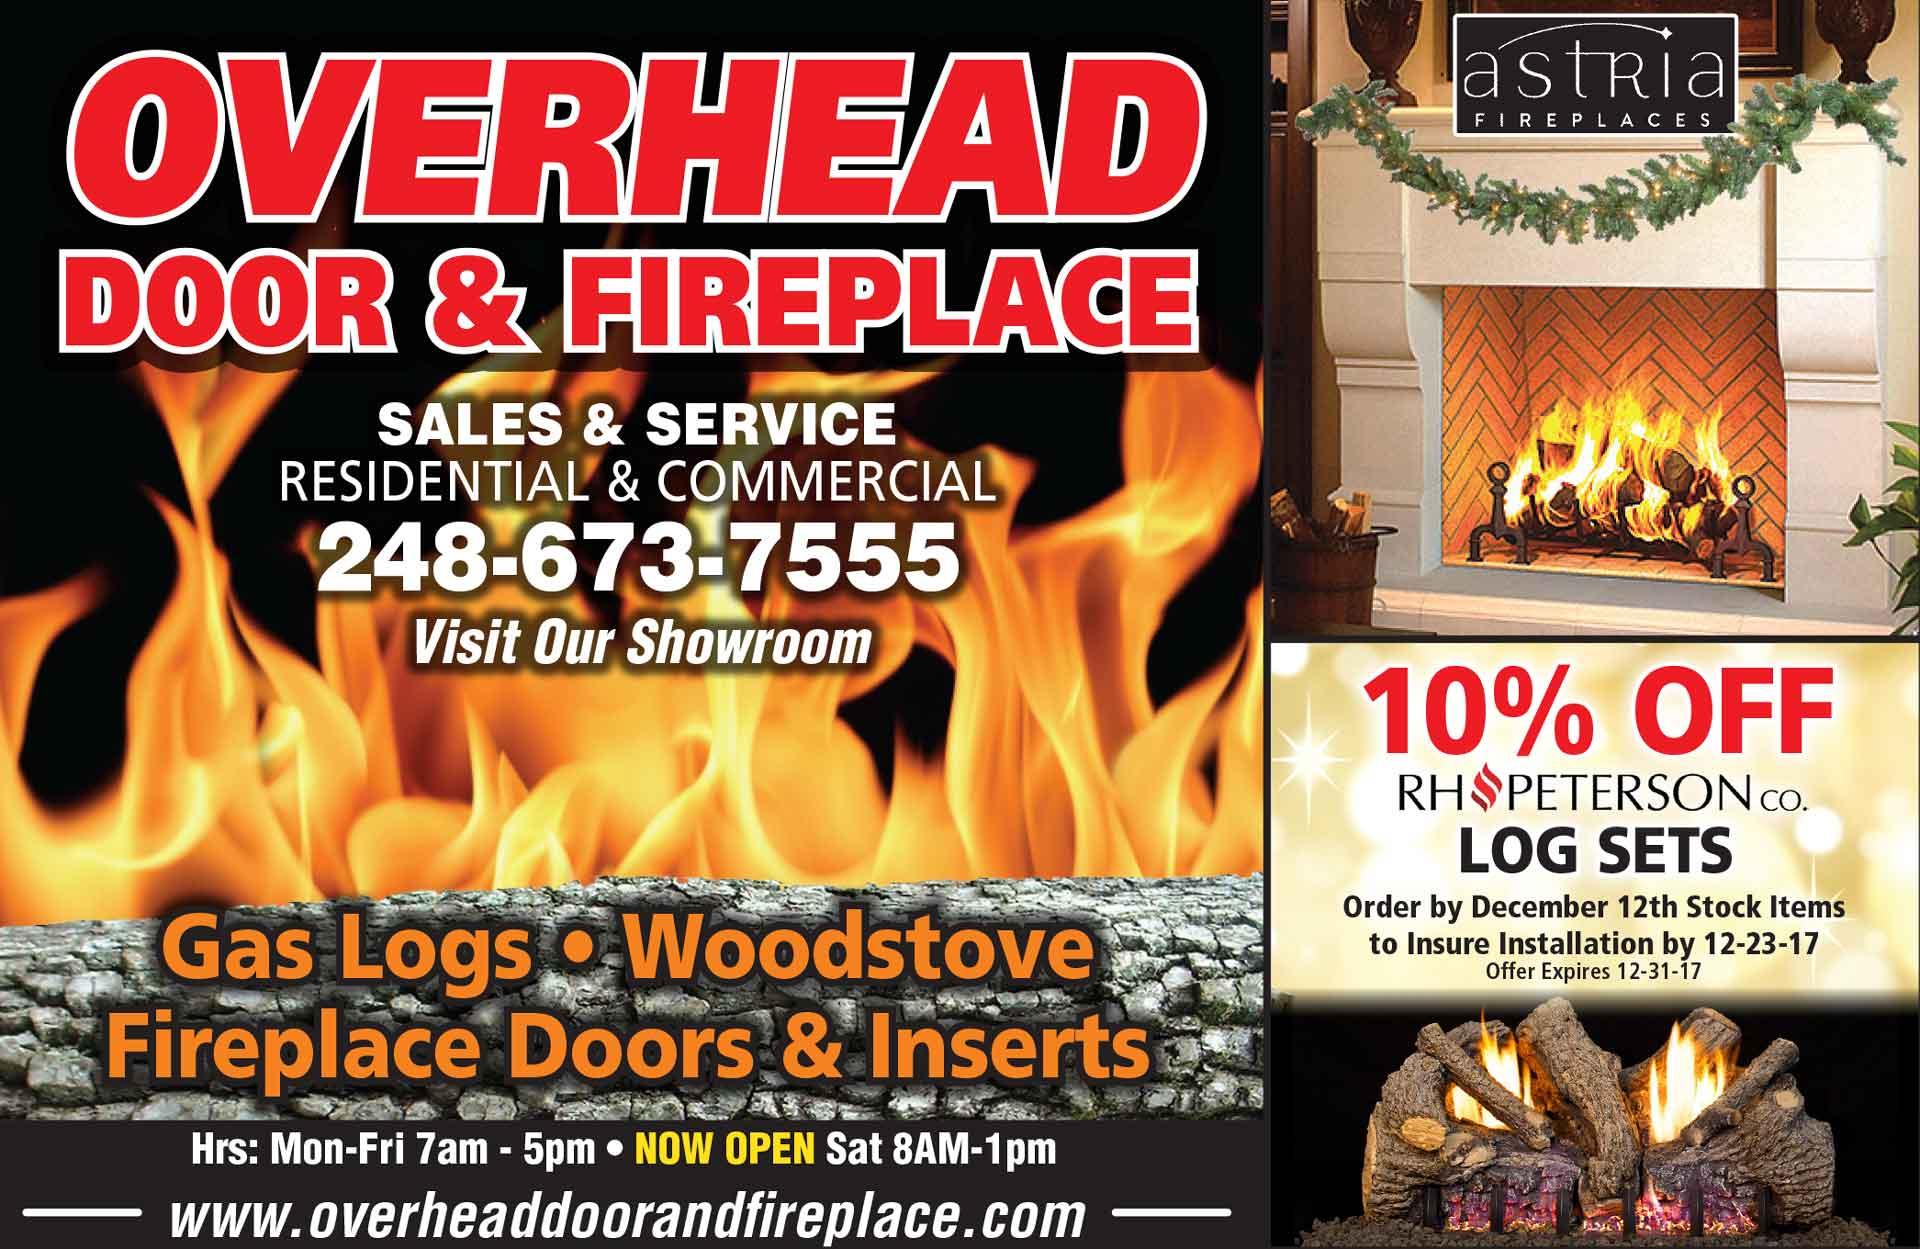 Overhead Fireplace Ad Nov Overhead Door Amp Fireplace Company